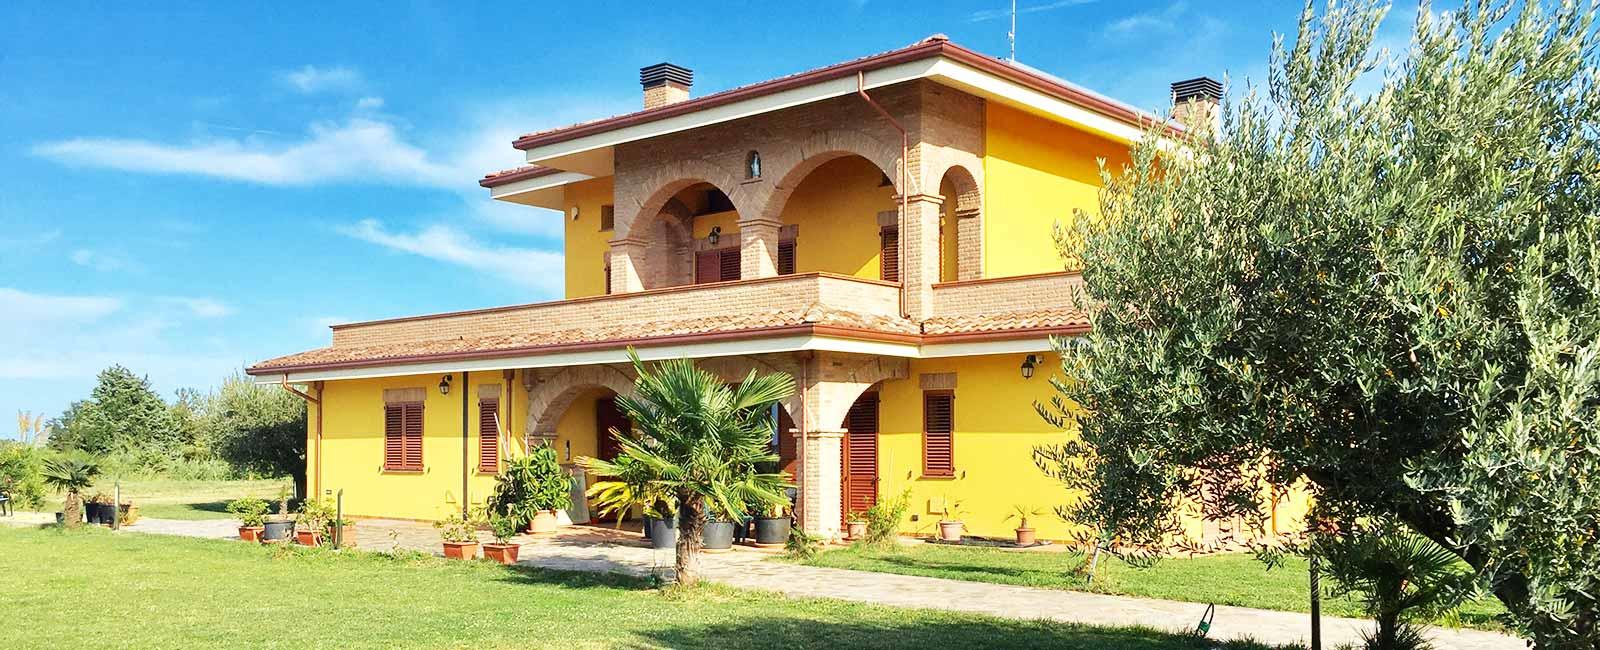 Apartments in Misano Adriatico mit Swimmingpool und Whirlpool